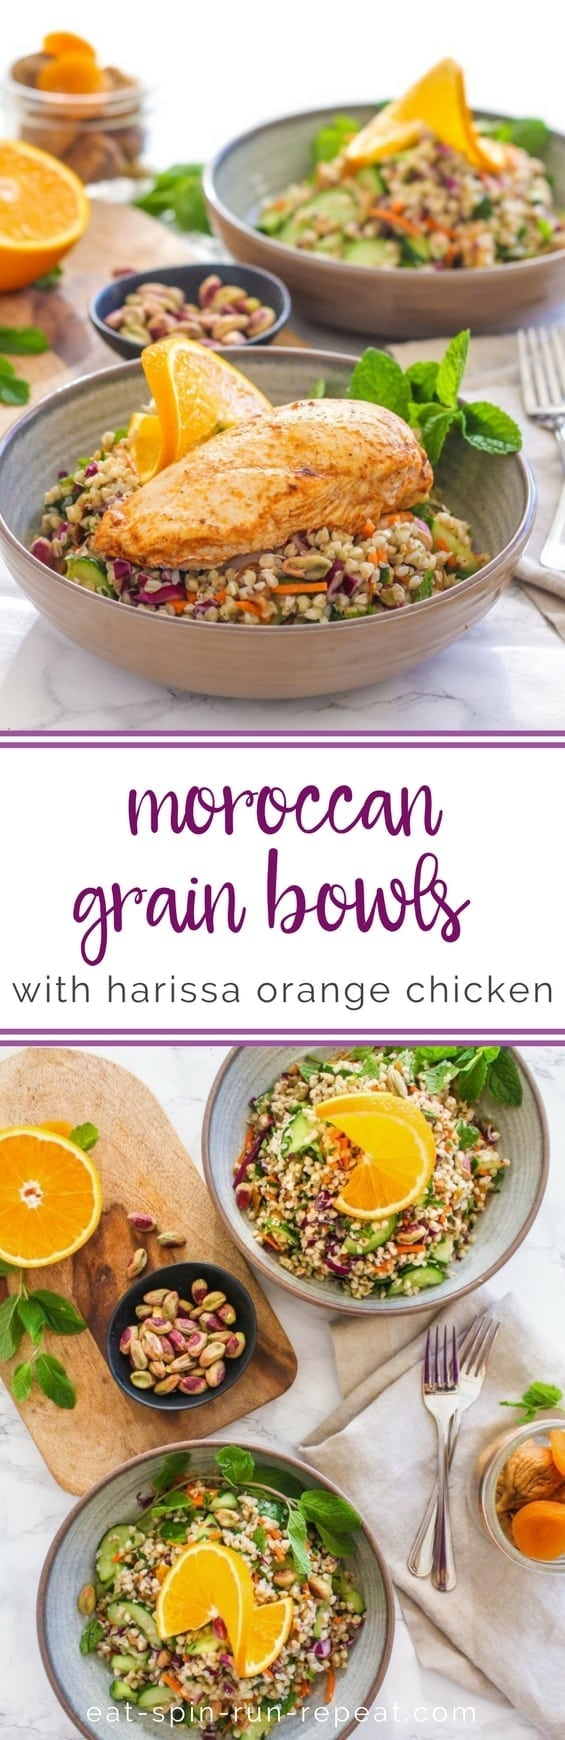 Moroccan Grain Bowls with Harissa Orange Chicken   #glutenfree #mealprep #harissa #moroccan #dairyfree #buckwheat   Recipe by Angela Simpson, Eat Spin Run Repeat